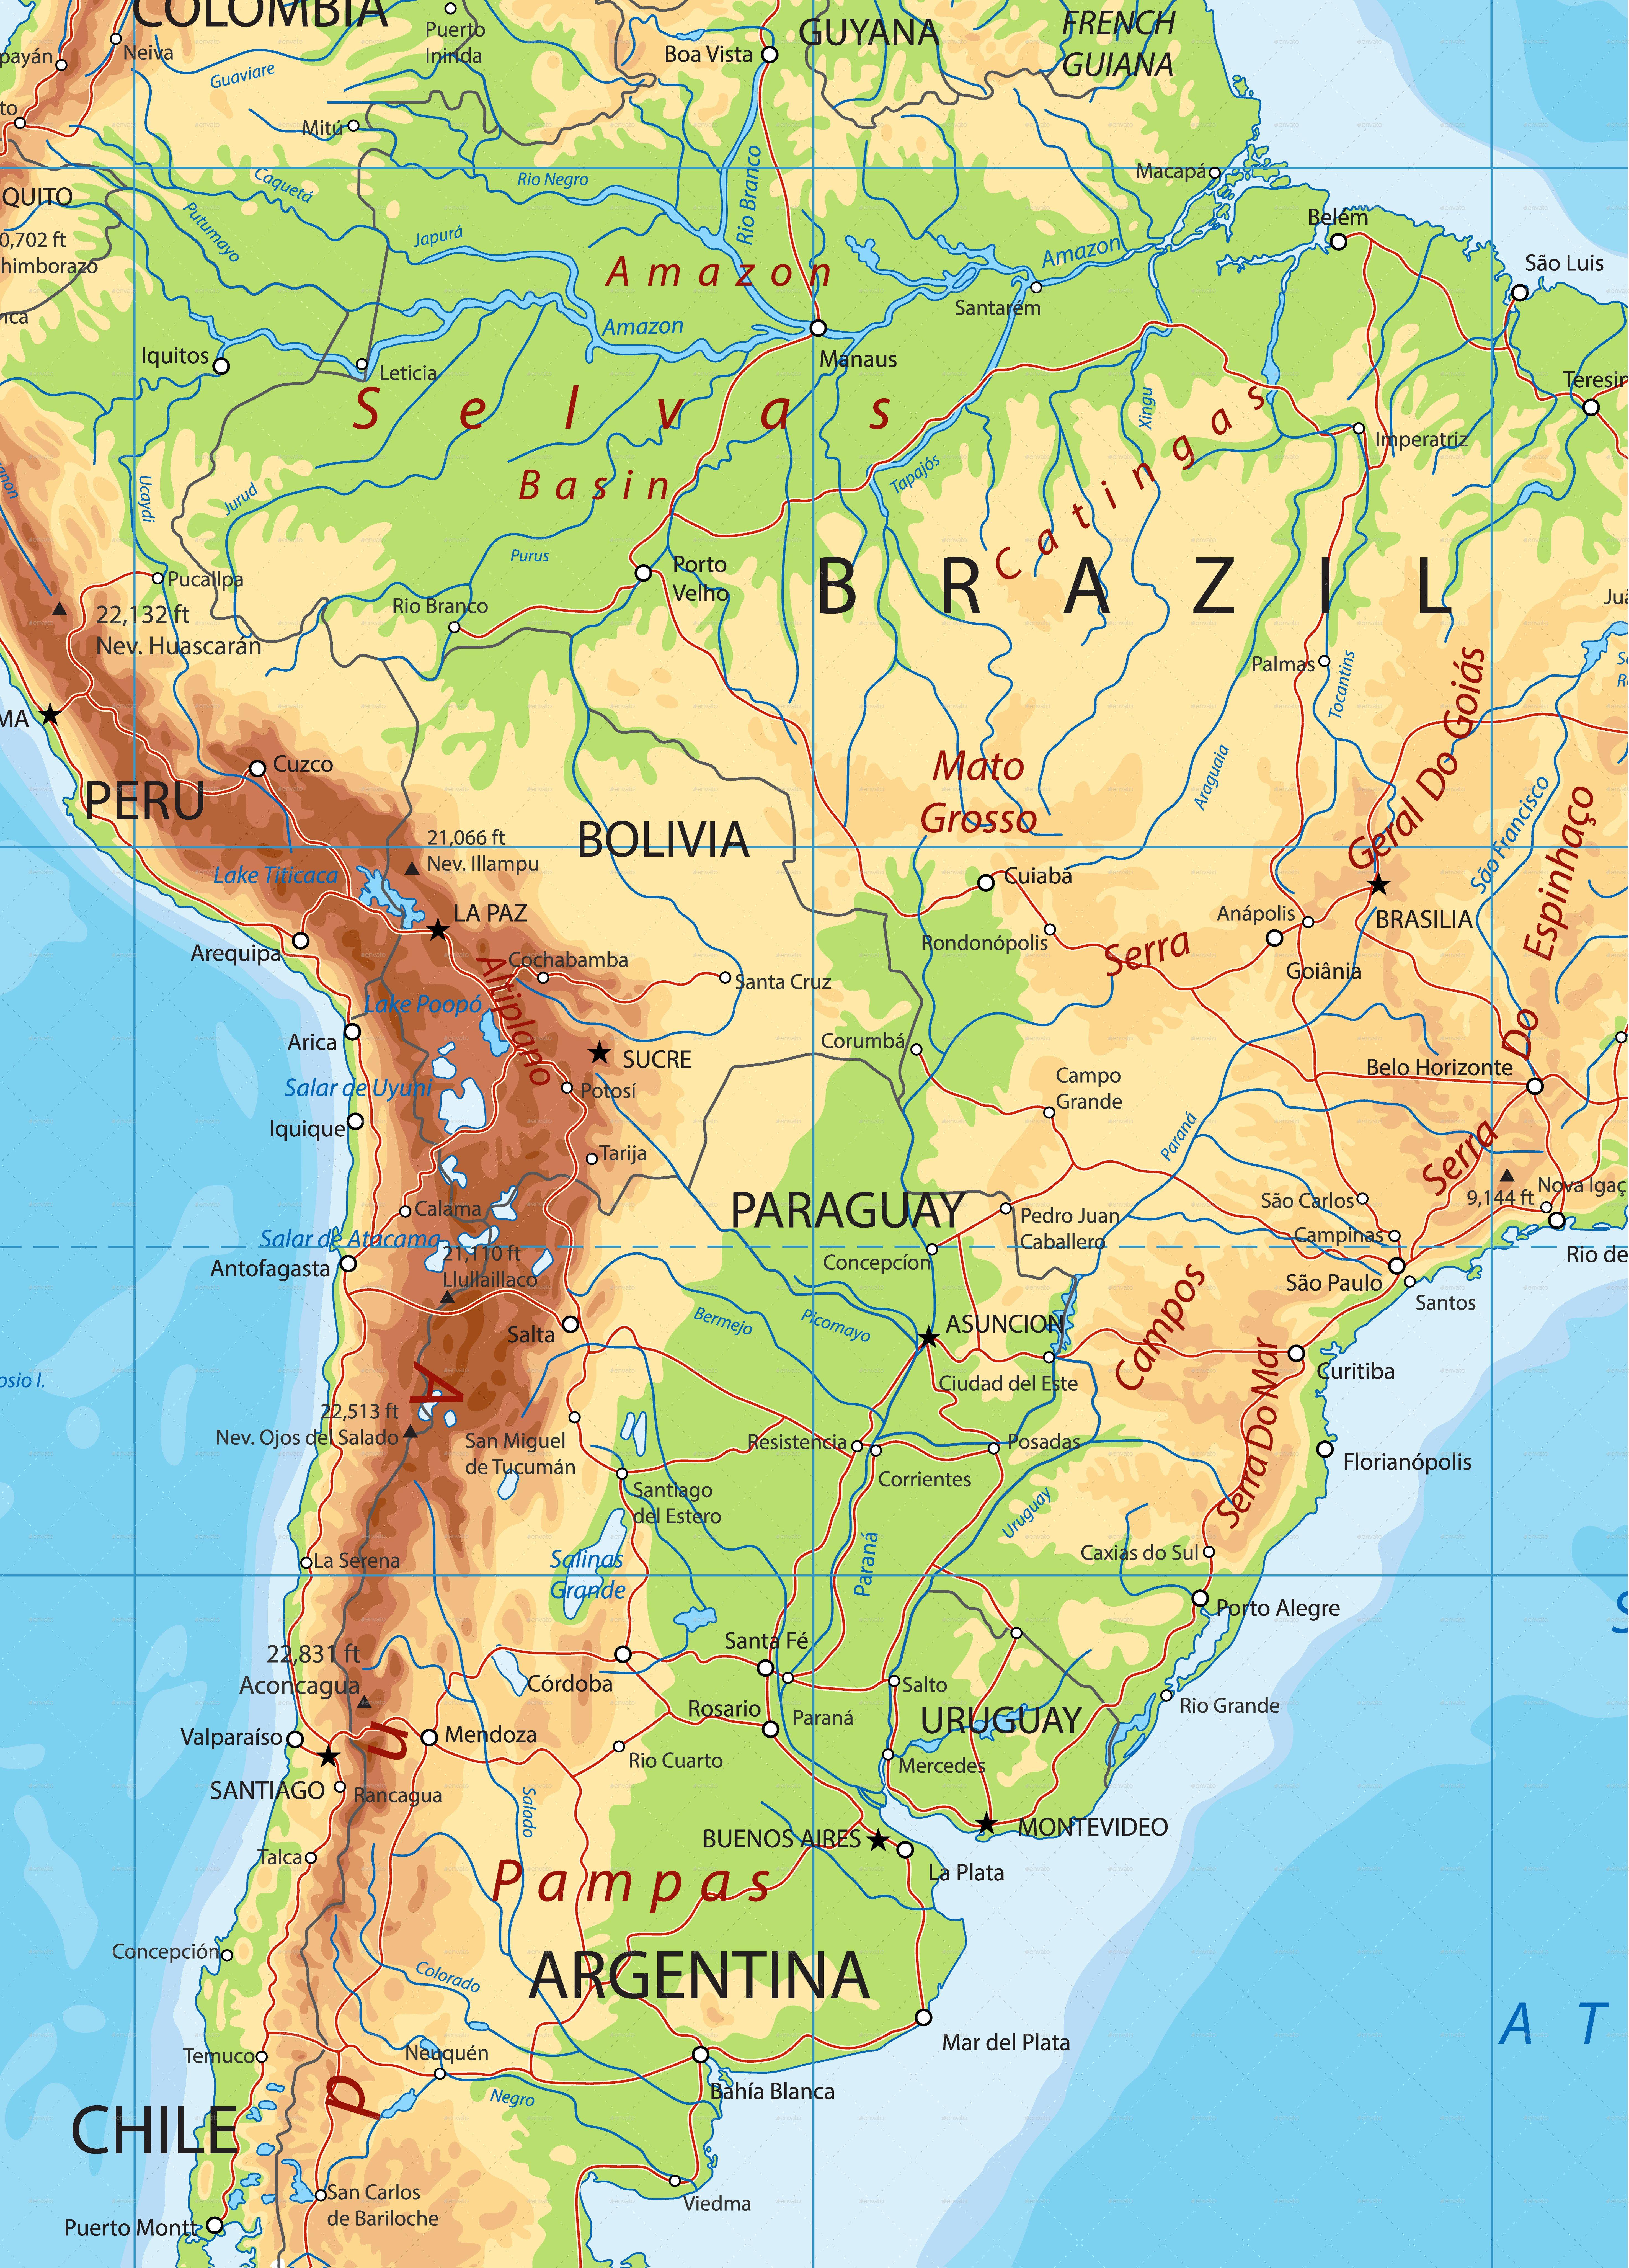 free print map physical map south america | Free prints ...